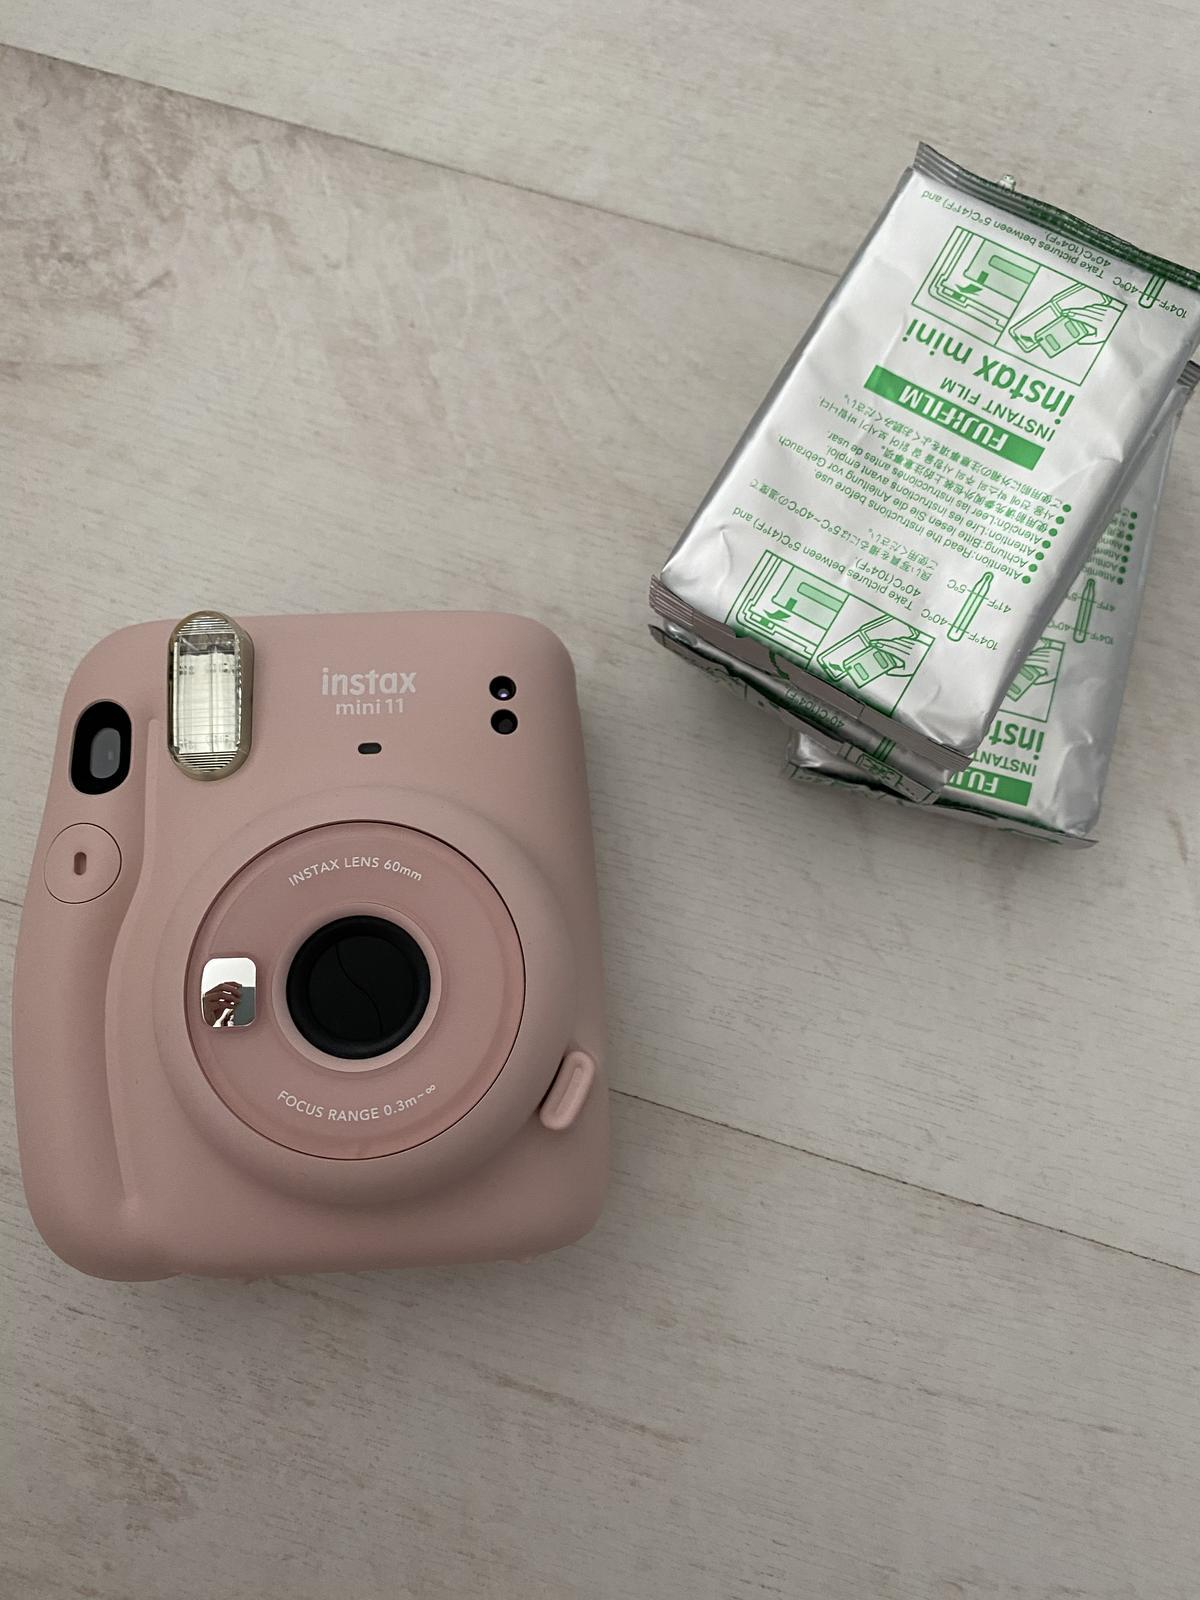 instax mini 11 blush-pink - Obrázok č. 1